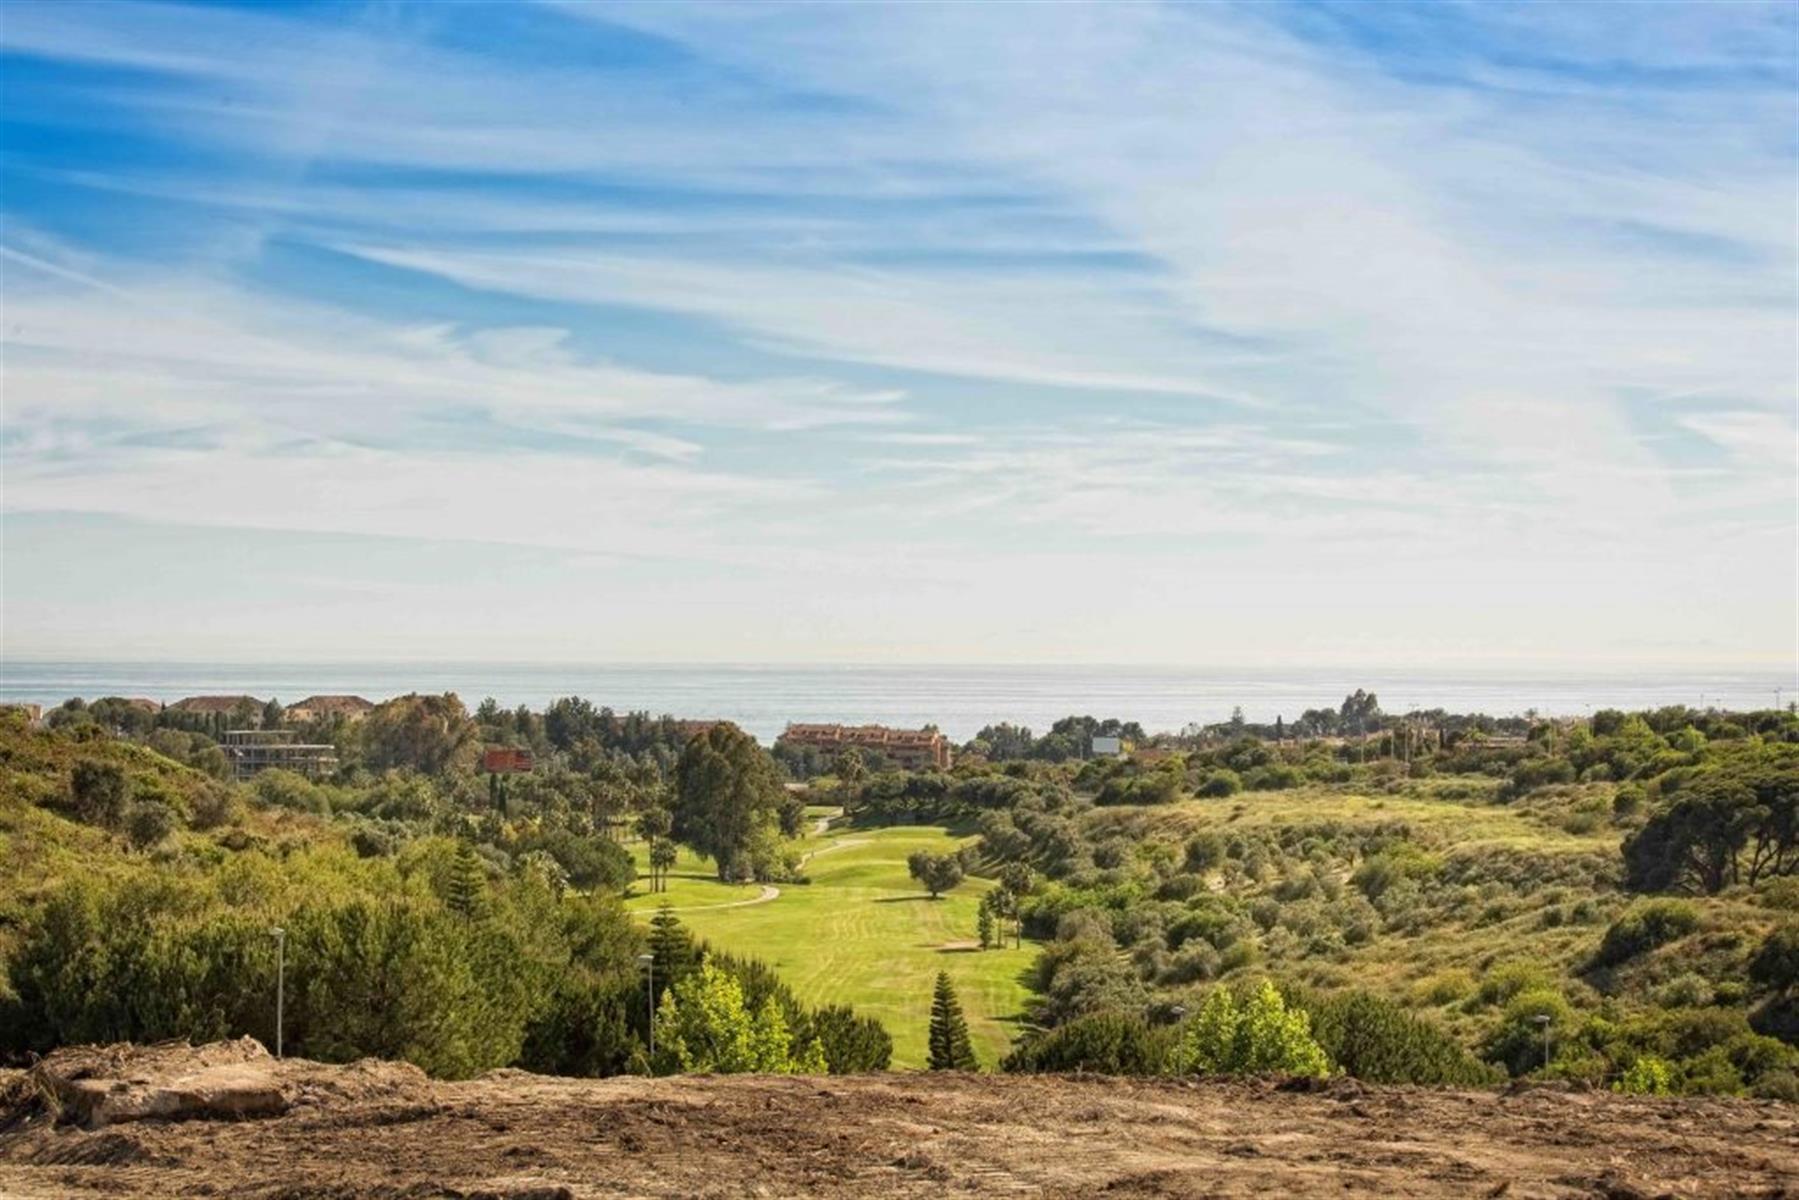 3 en 4 Slaapkamer villas in Marbella -Ref 2107331